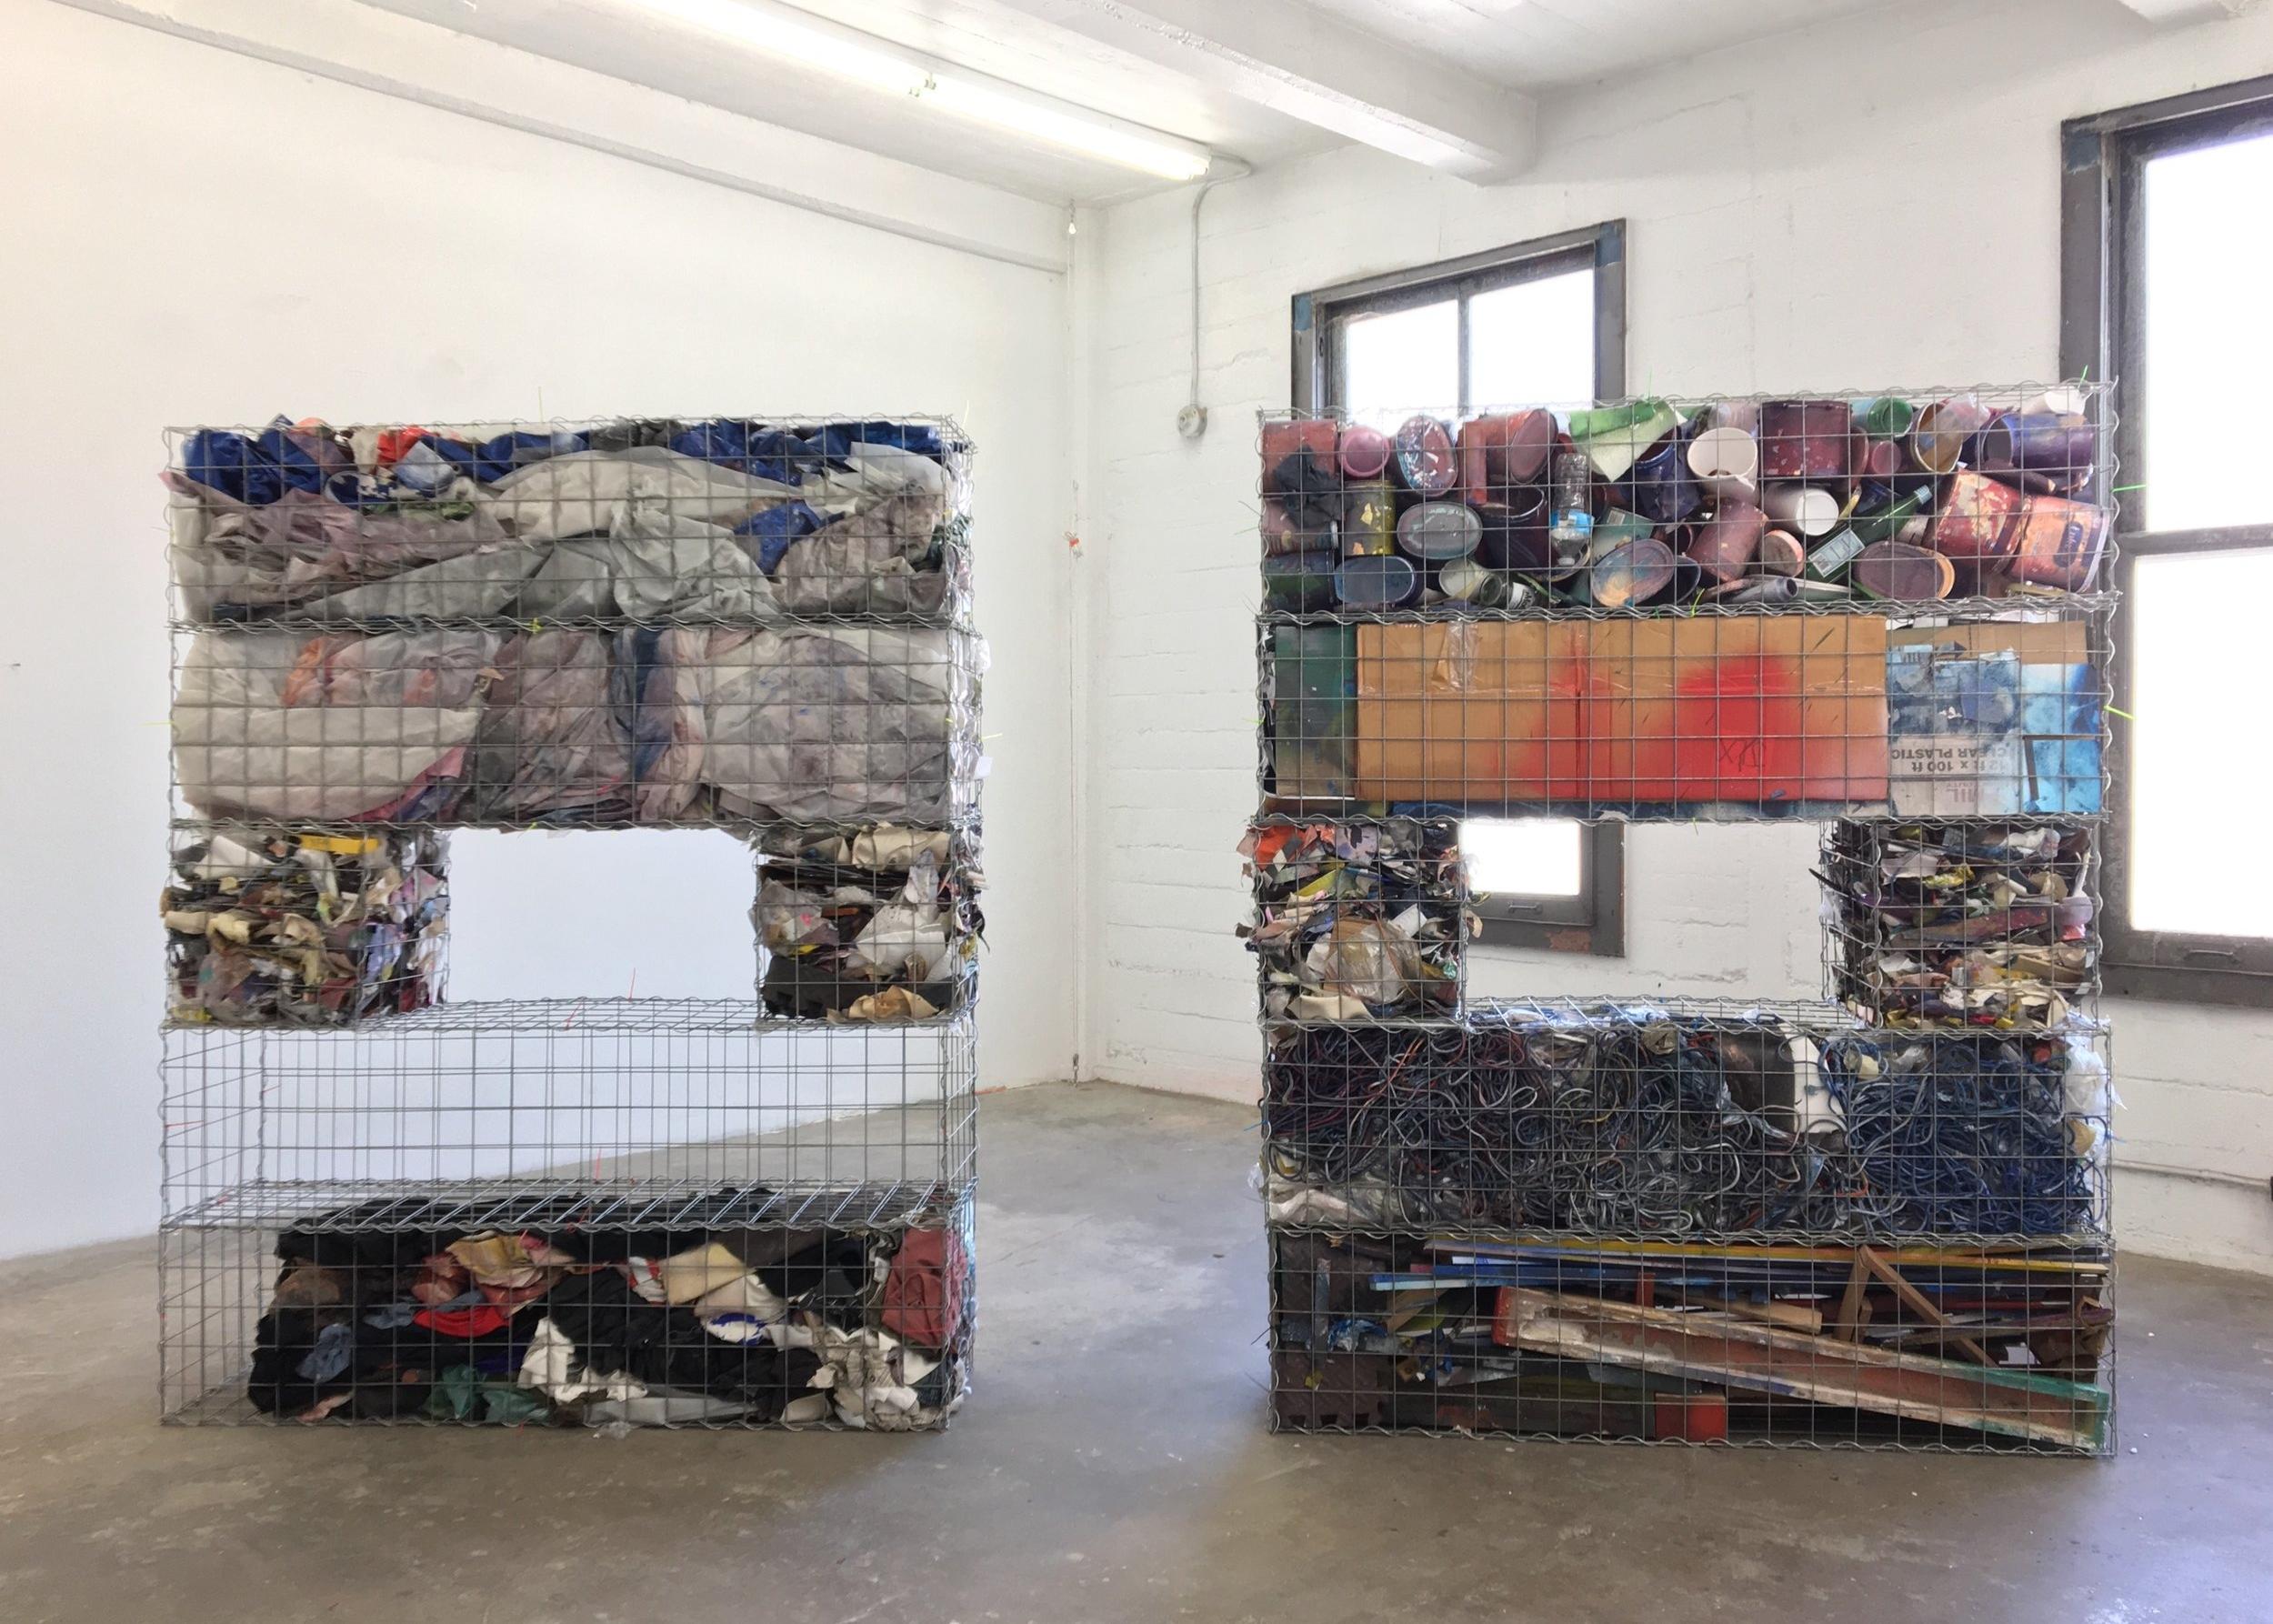 IAIN MUIRHEAD   1726:1737  , 2014-2017. Gabion baskets, zip ties, aggregate studio material. Diptych 76 x 60 x 16 inches each.